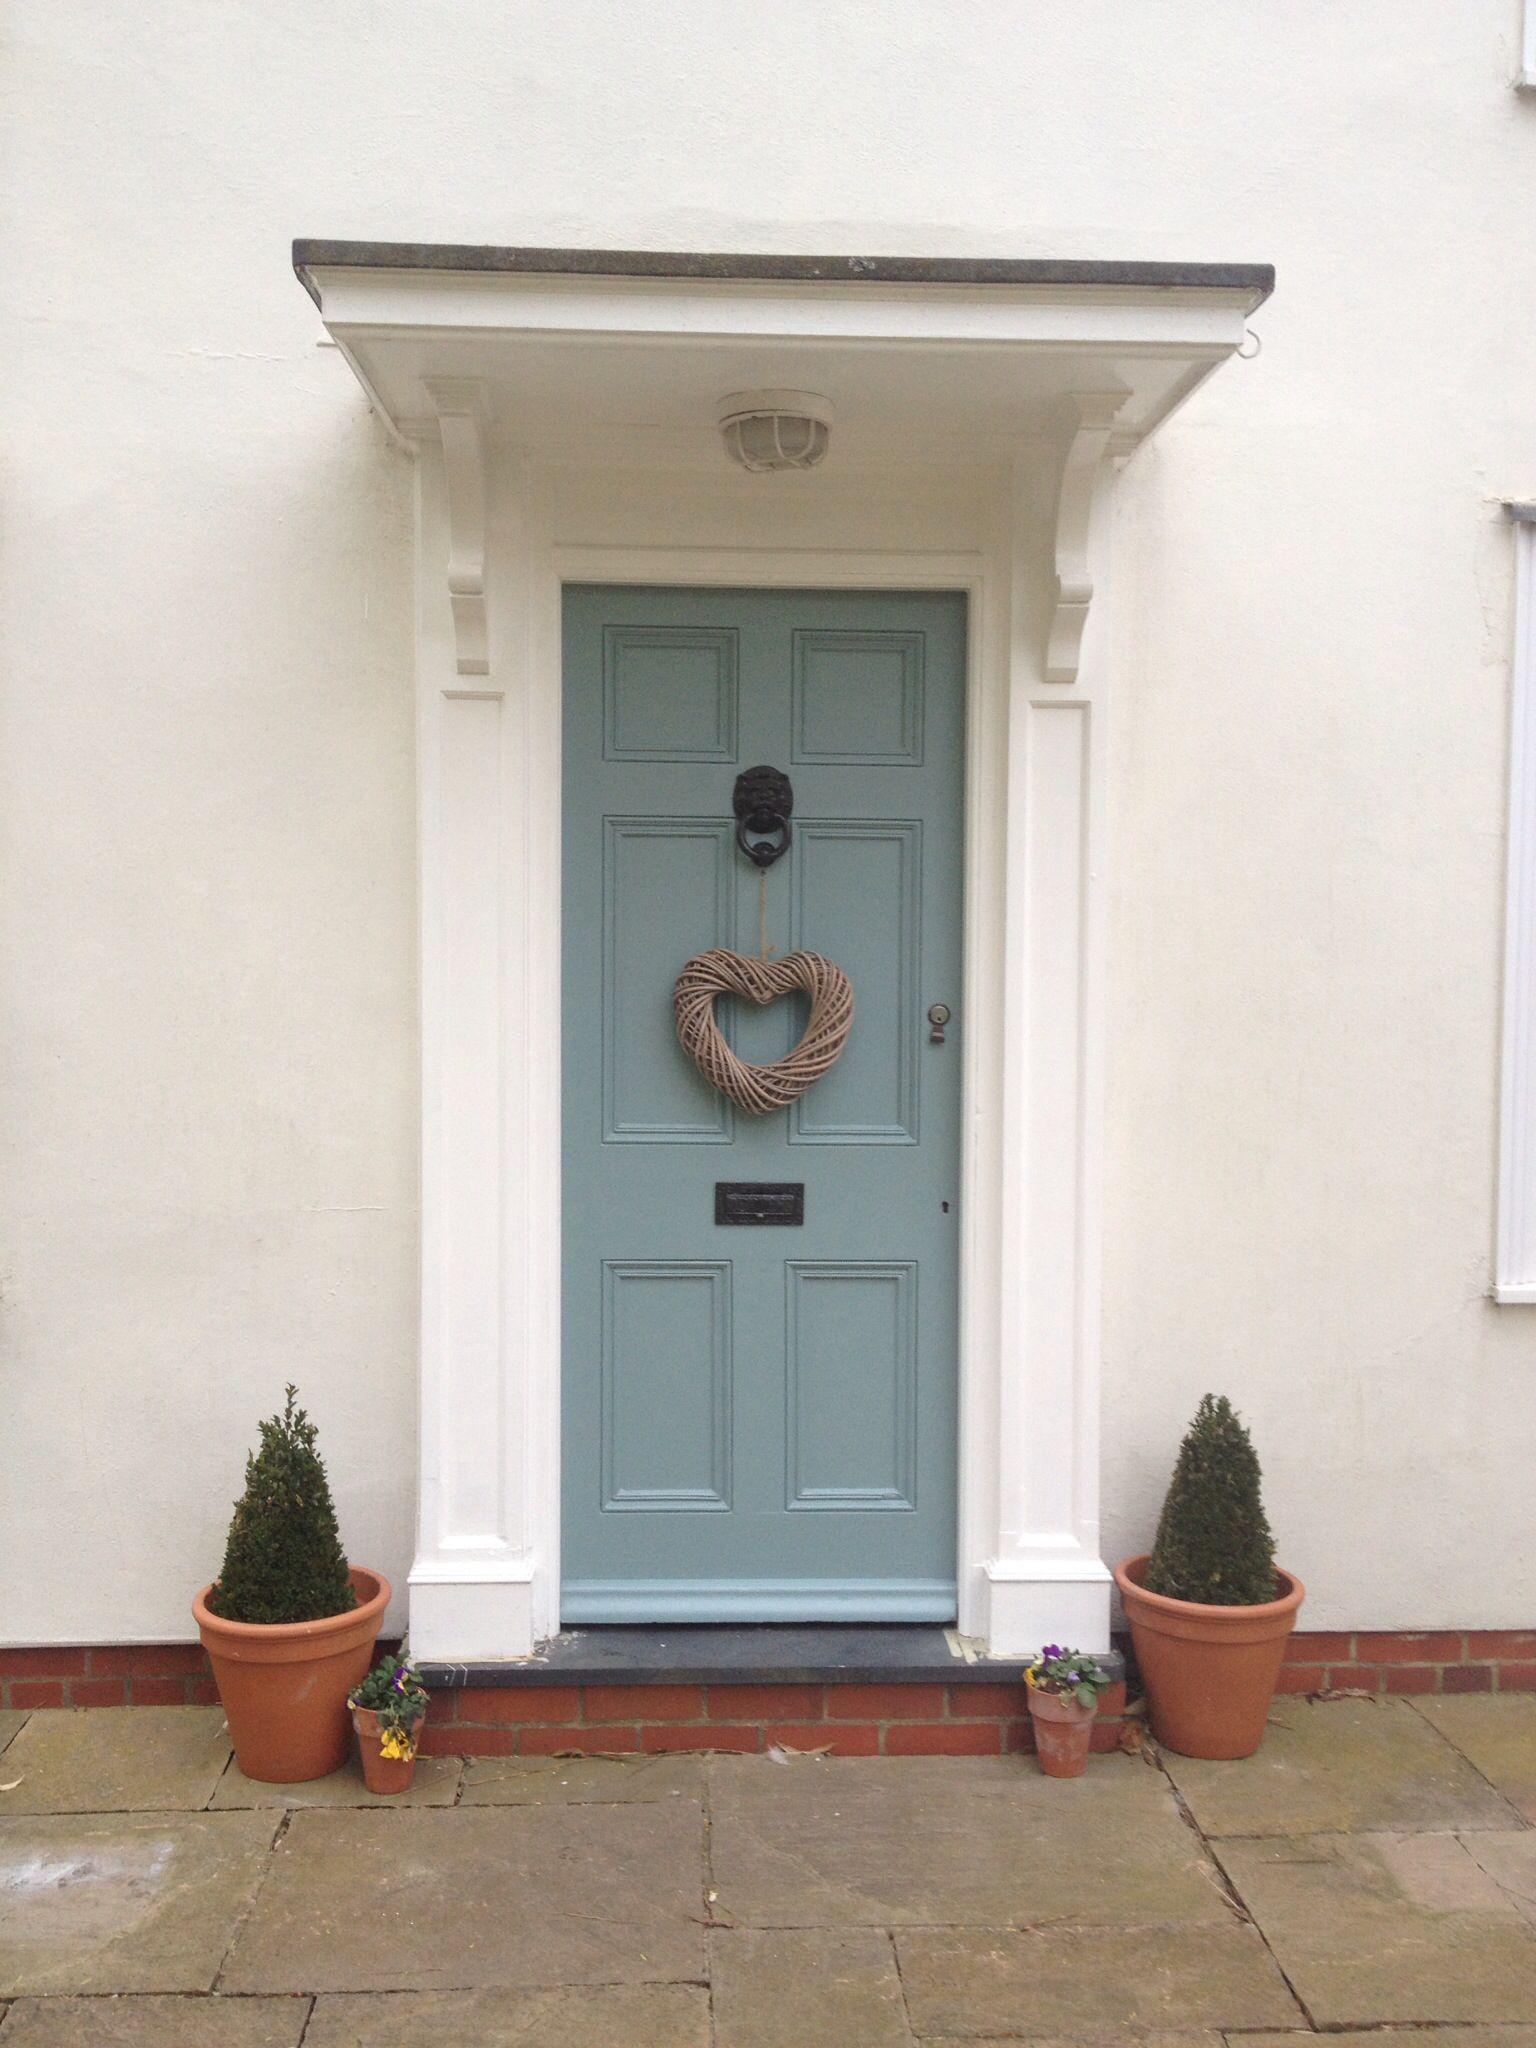 Farrow and ball oval room blue my new house pinterest - Farrow and ball exterior door paint ...